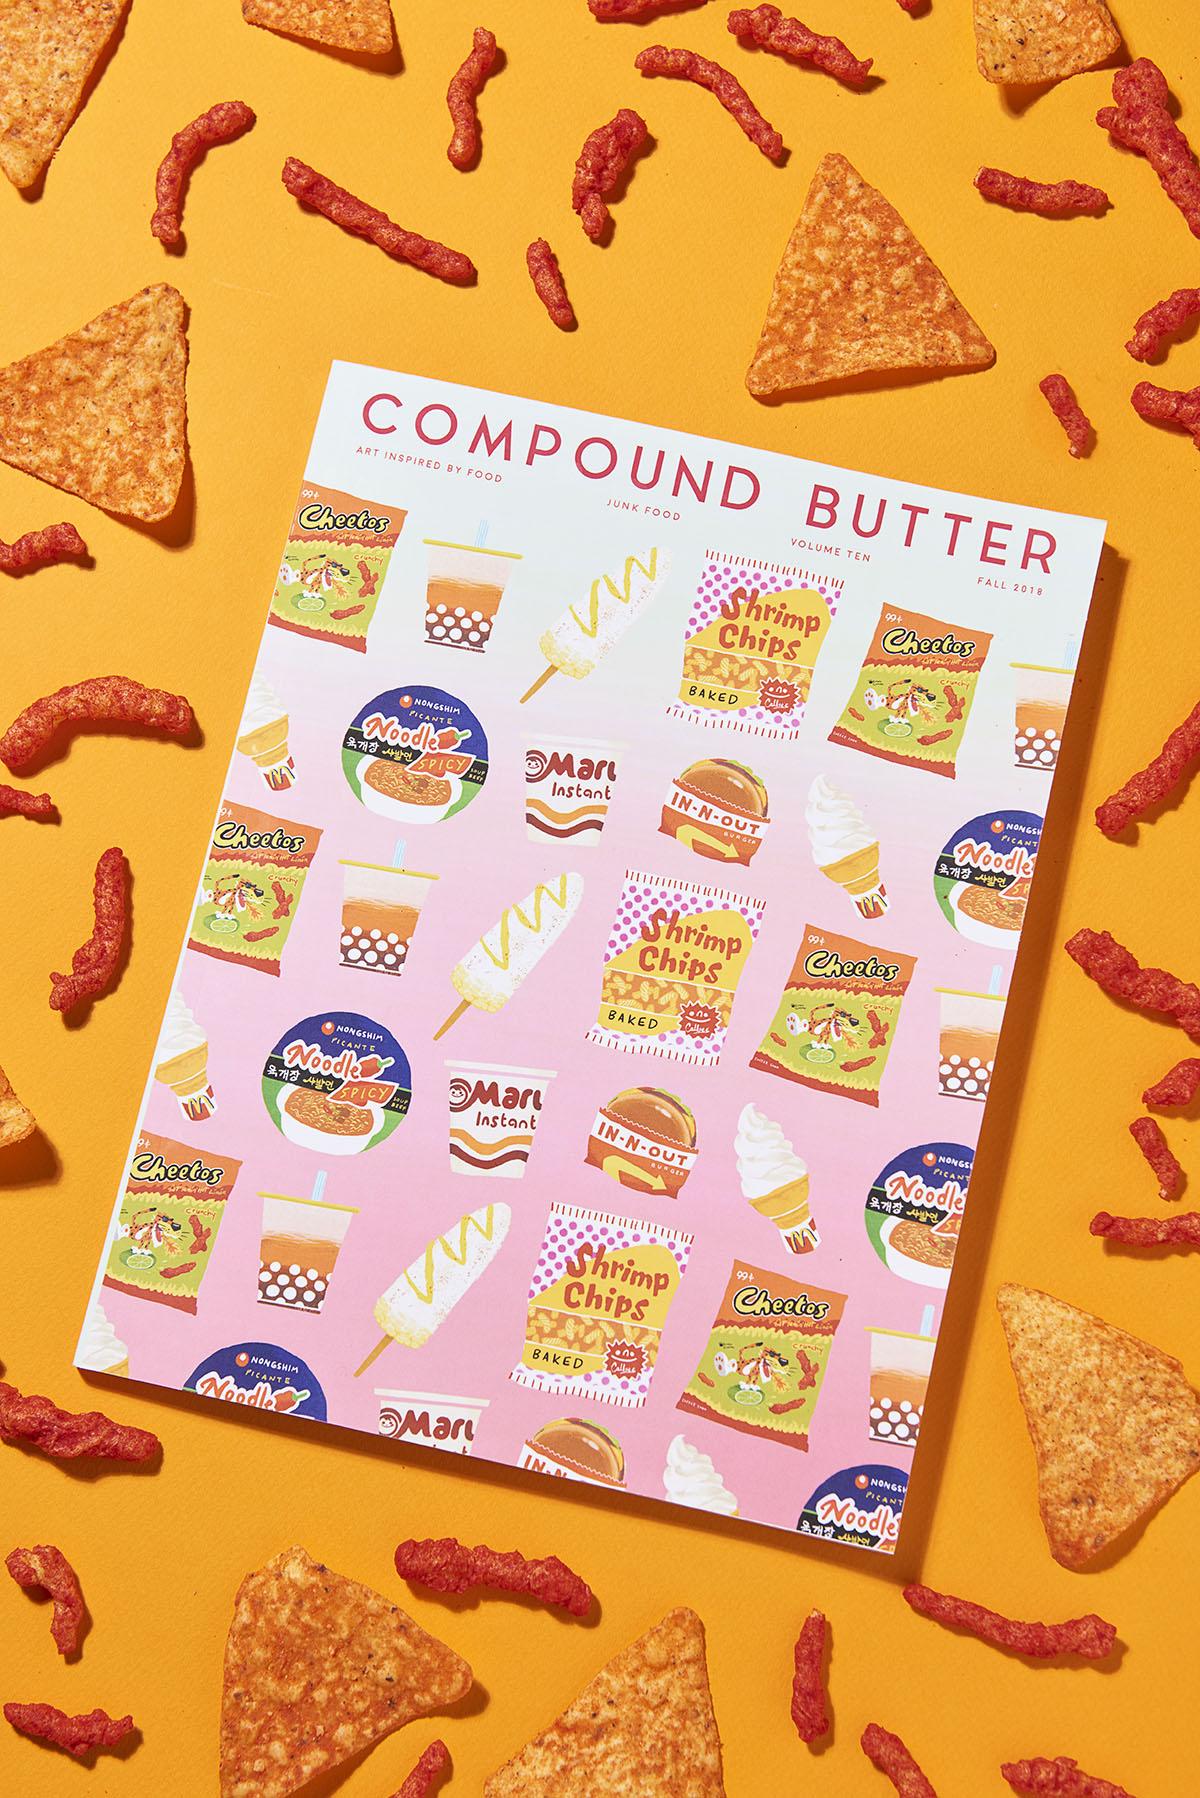 Yasara Gunawardena – Compund Butter – Junk Food – Snacks